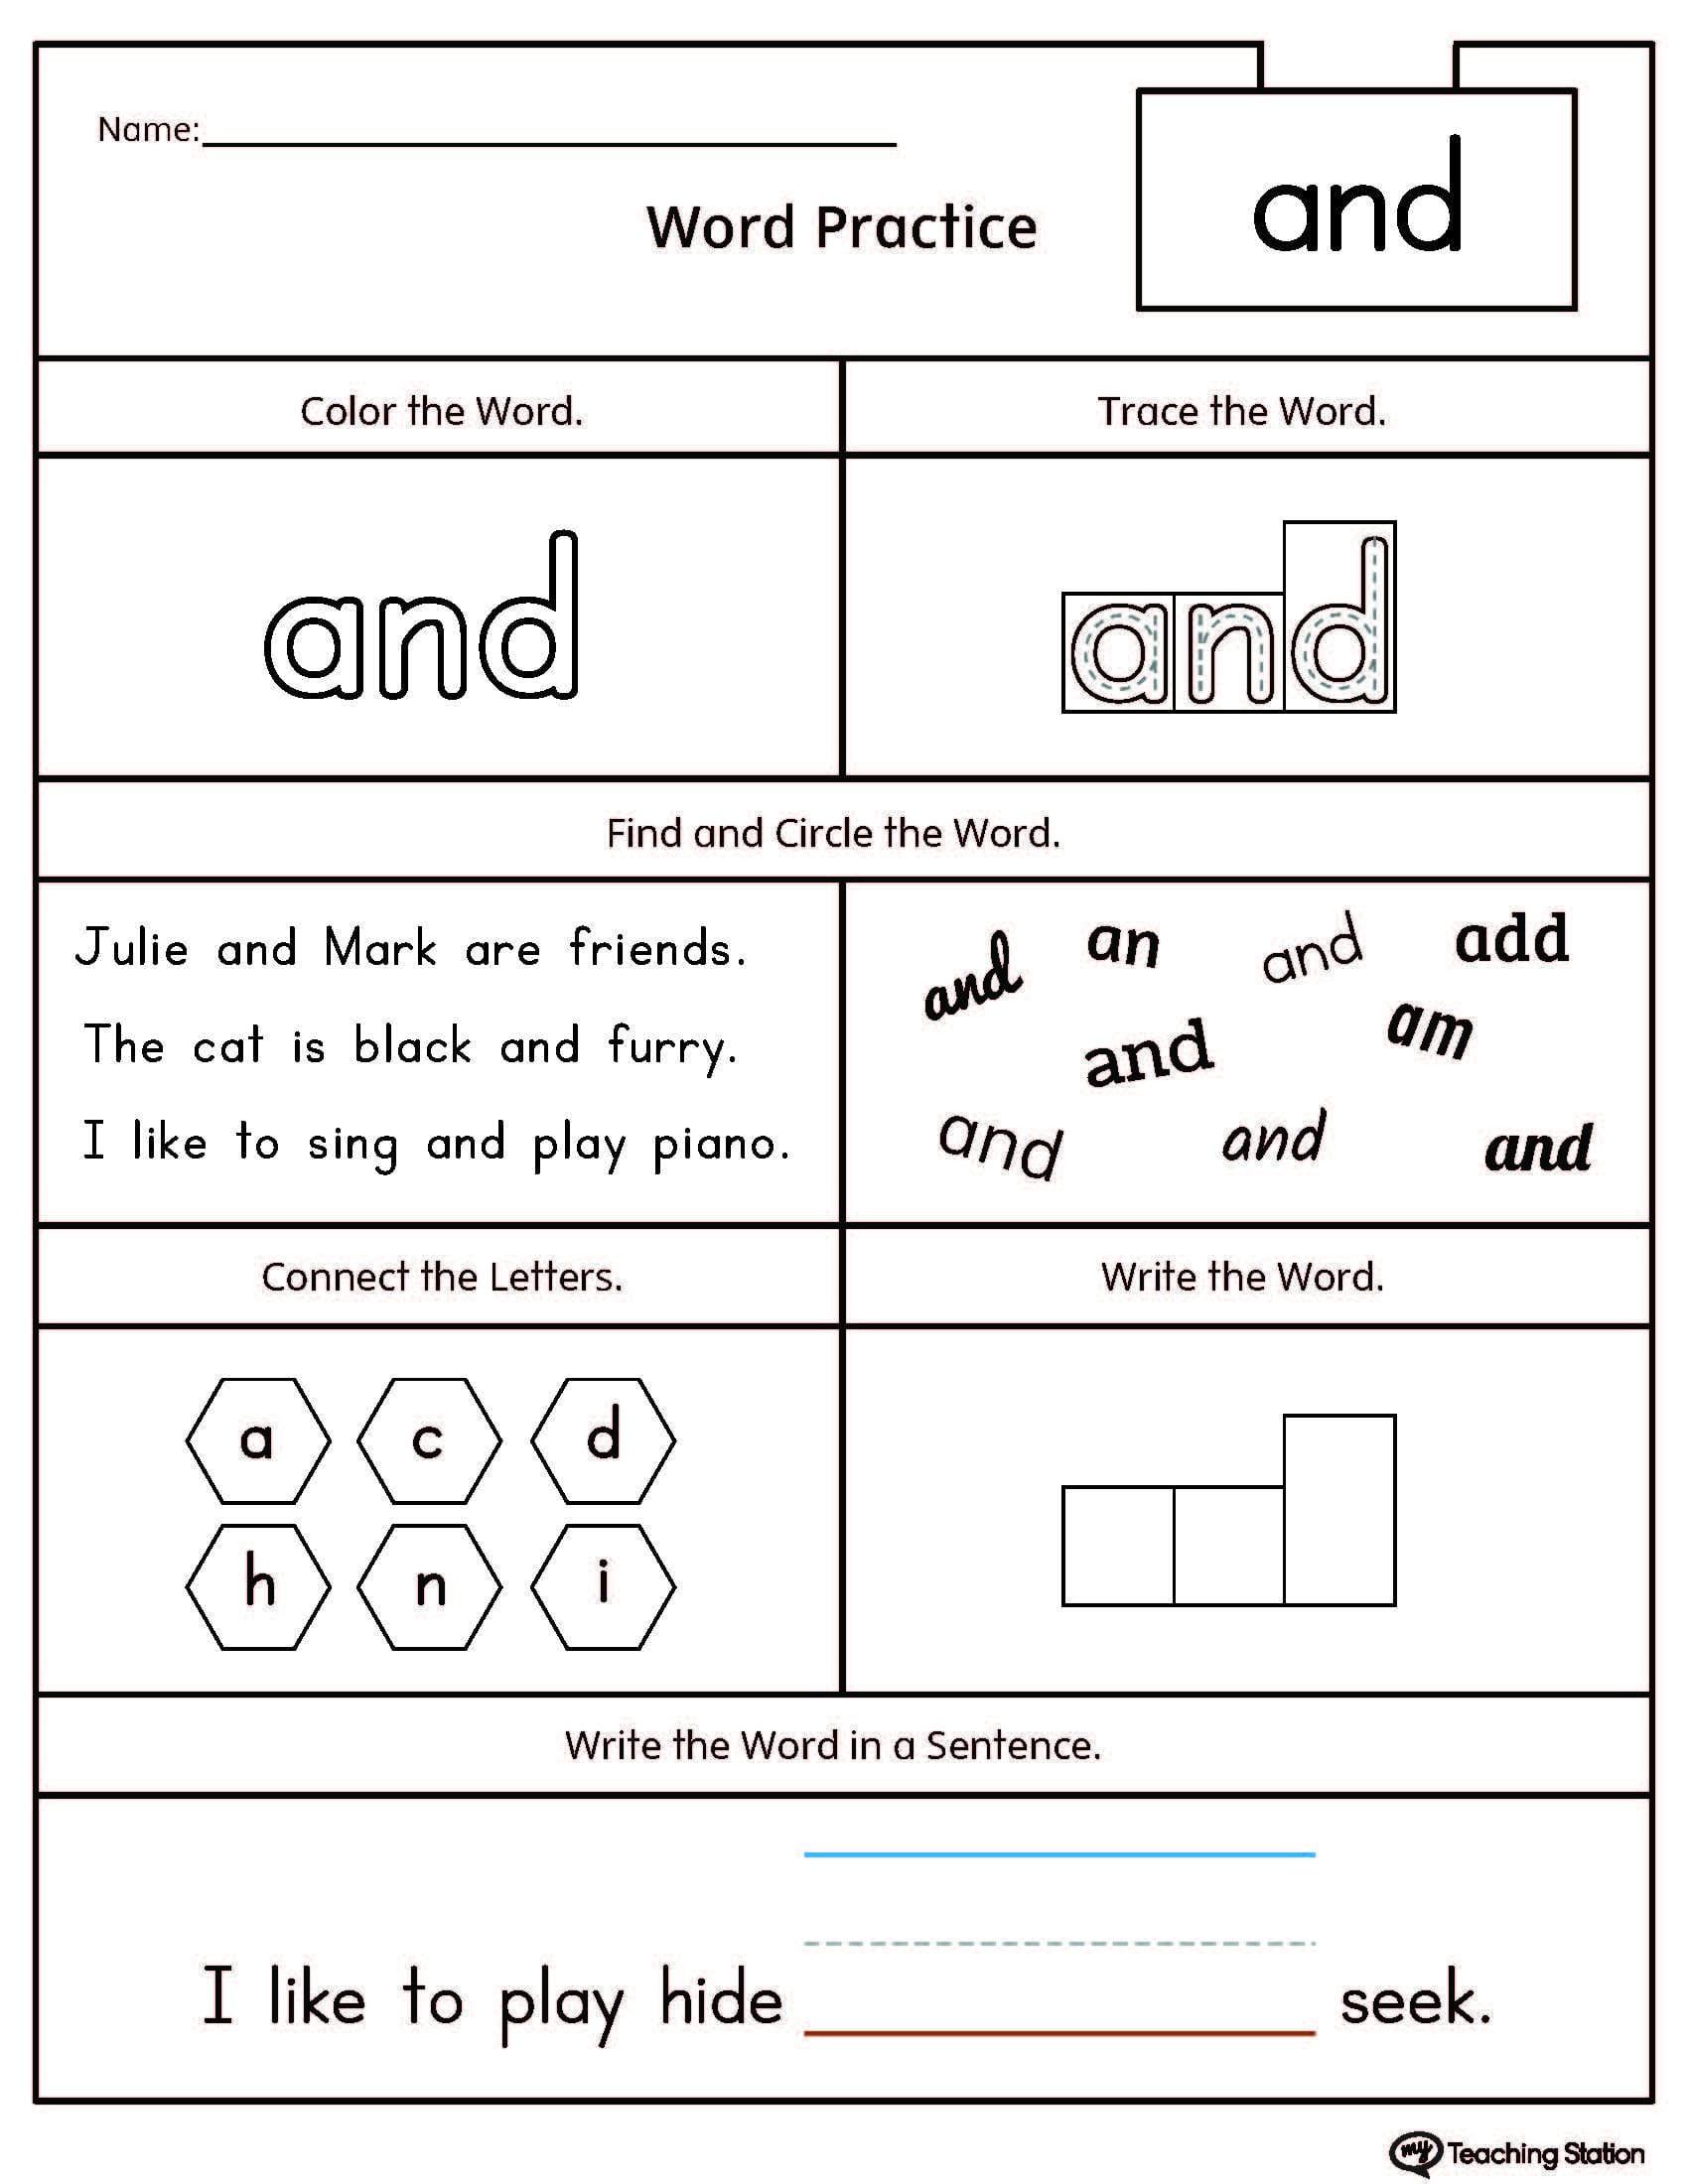 Early Childhood Reading Worksheets Myteachingstation